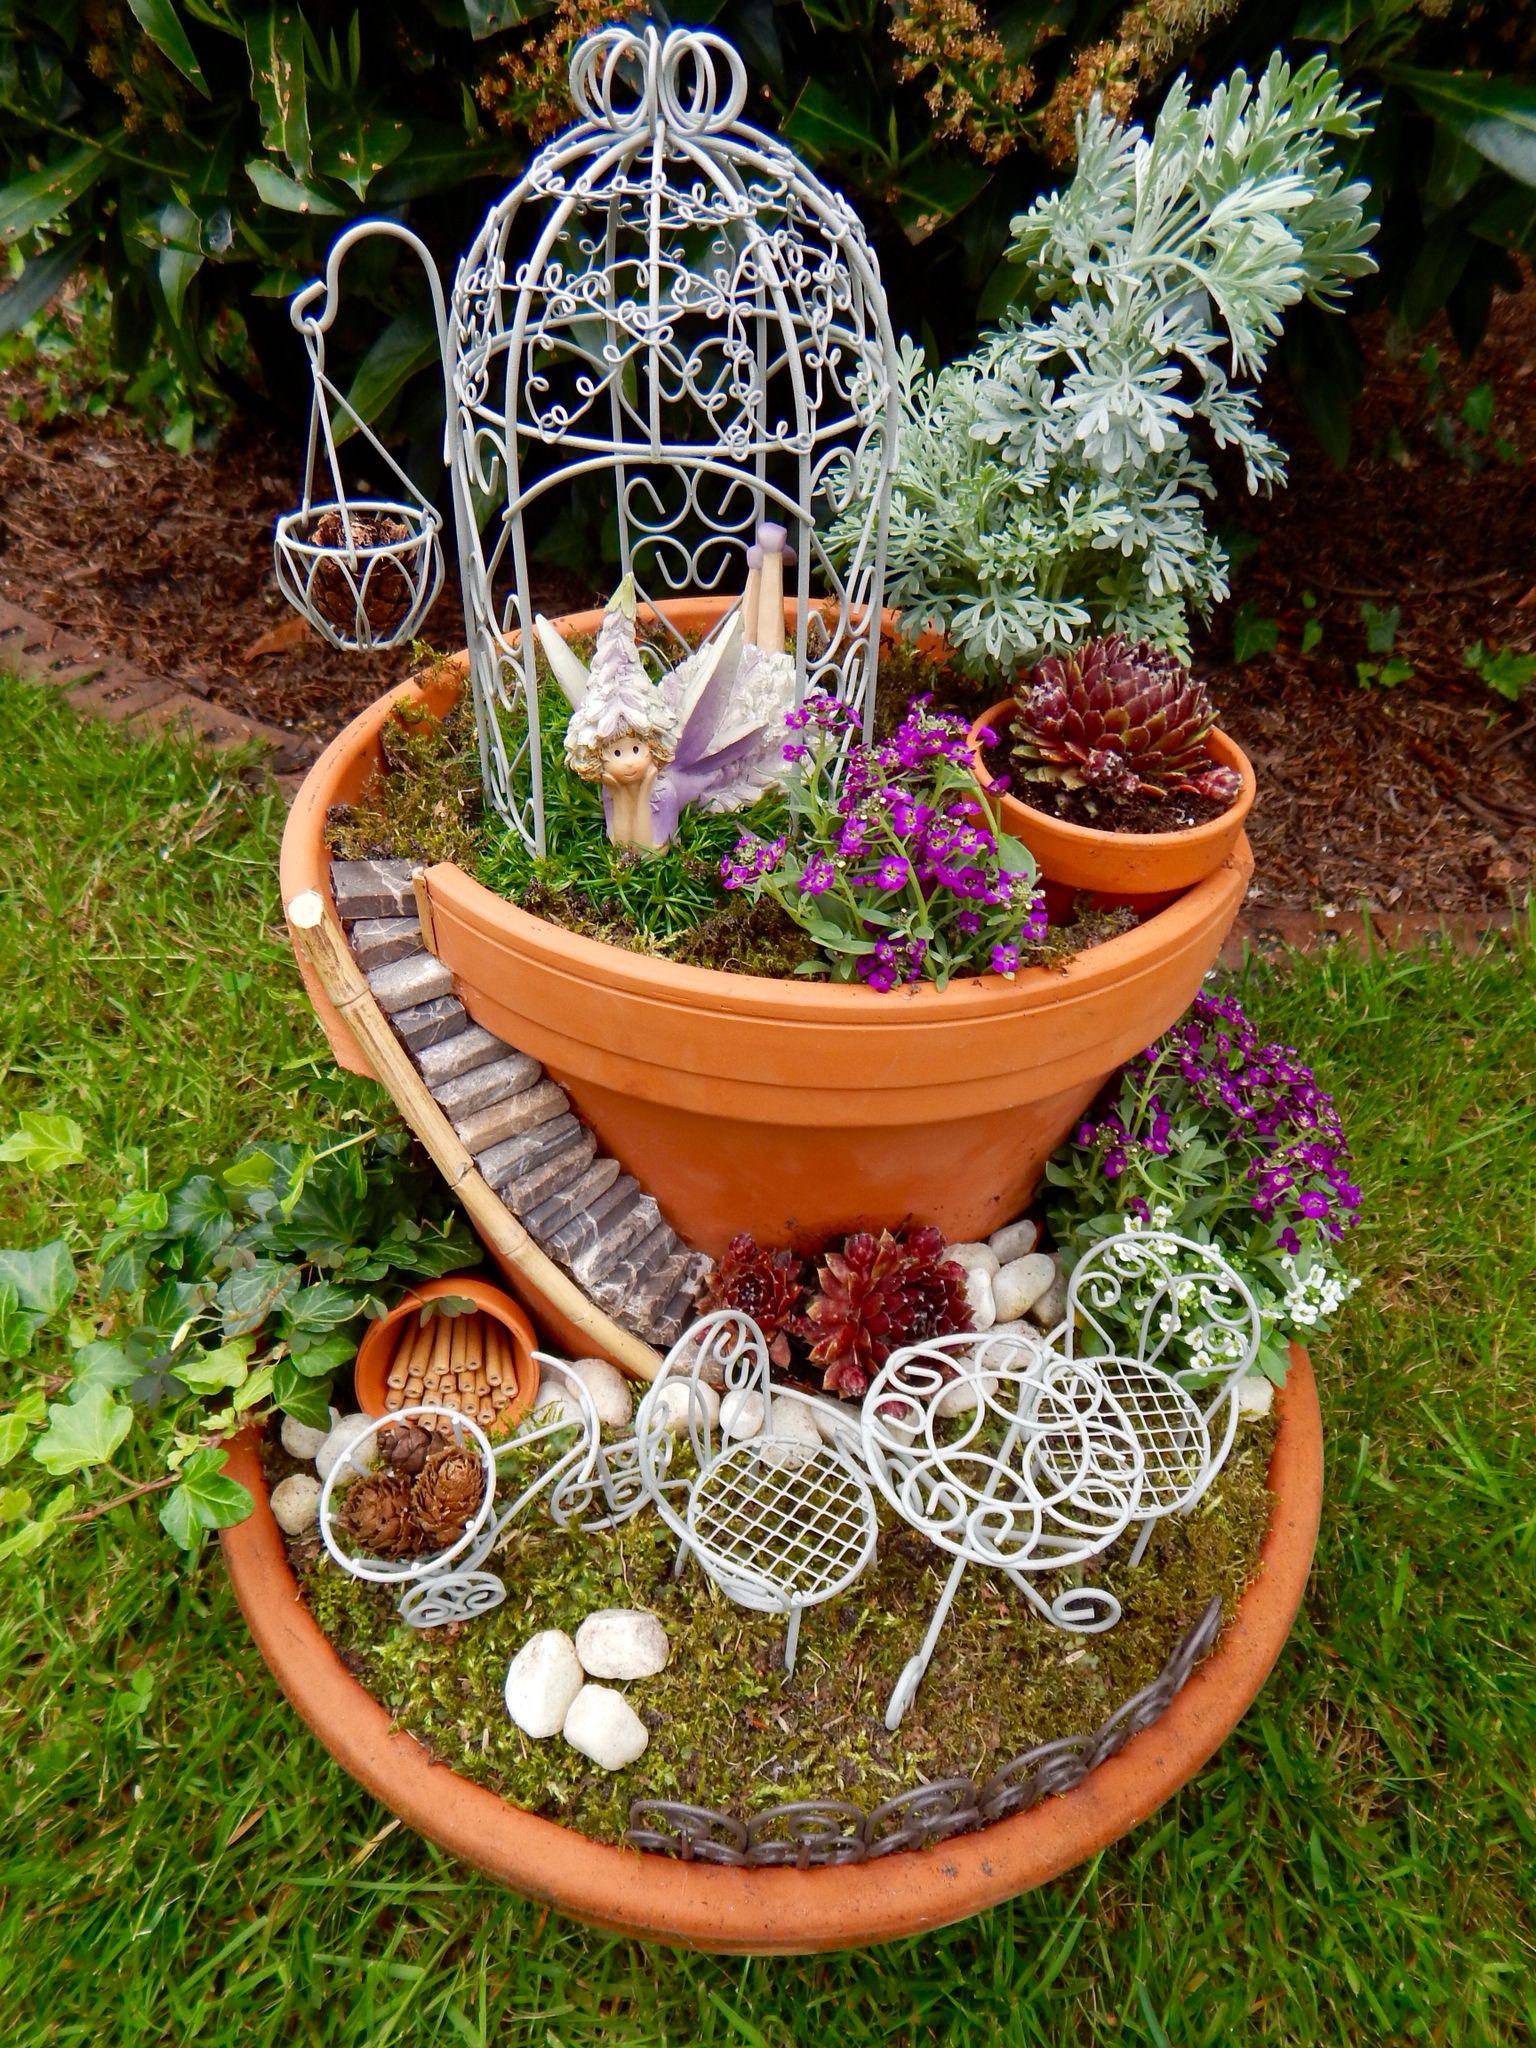 selbst gebauter und bepflanzter Feengarten | Unser Garten ...